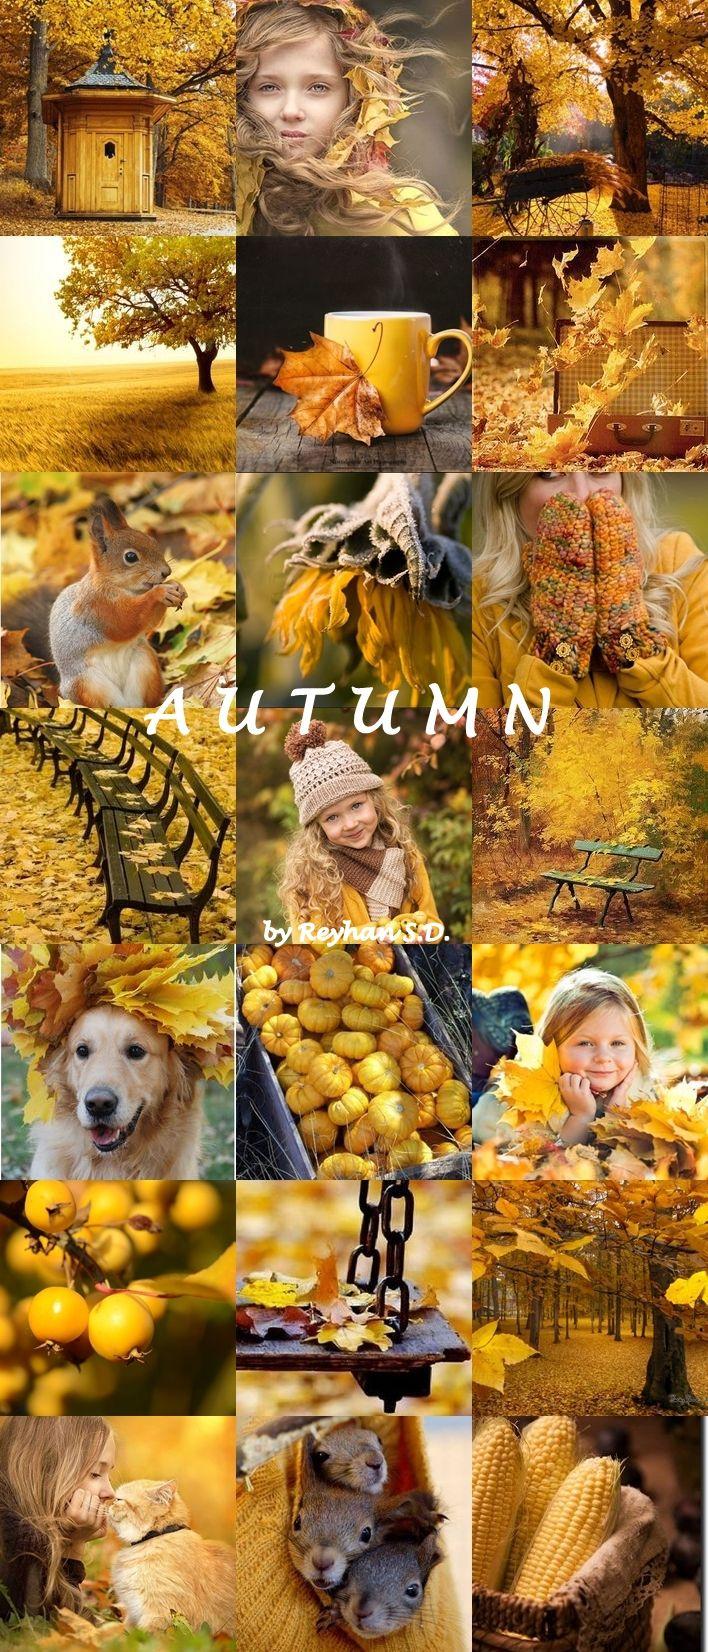 '' Autumn Shades of Yellow '' by Reyhan Seran Dursun